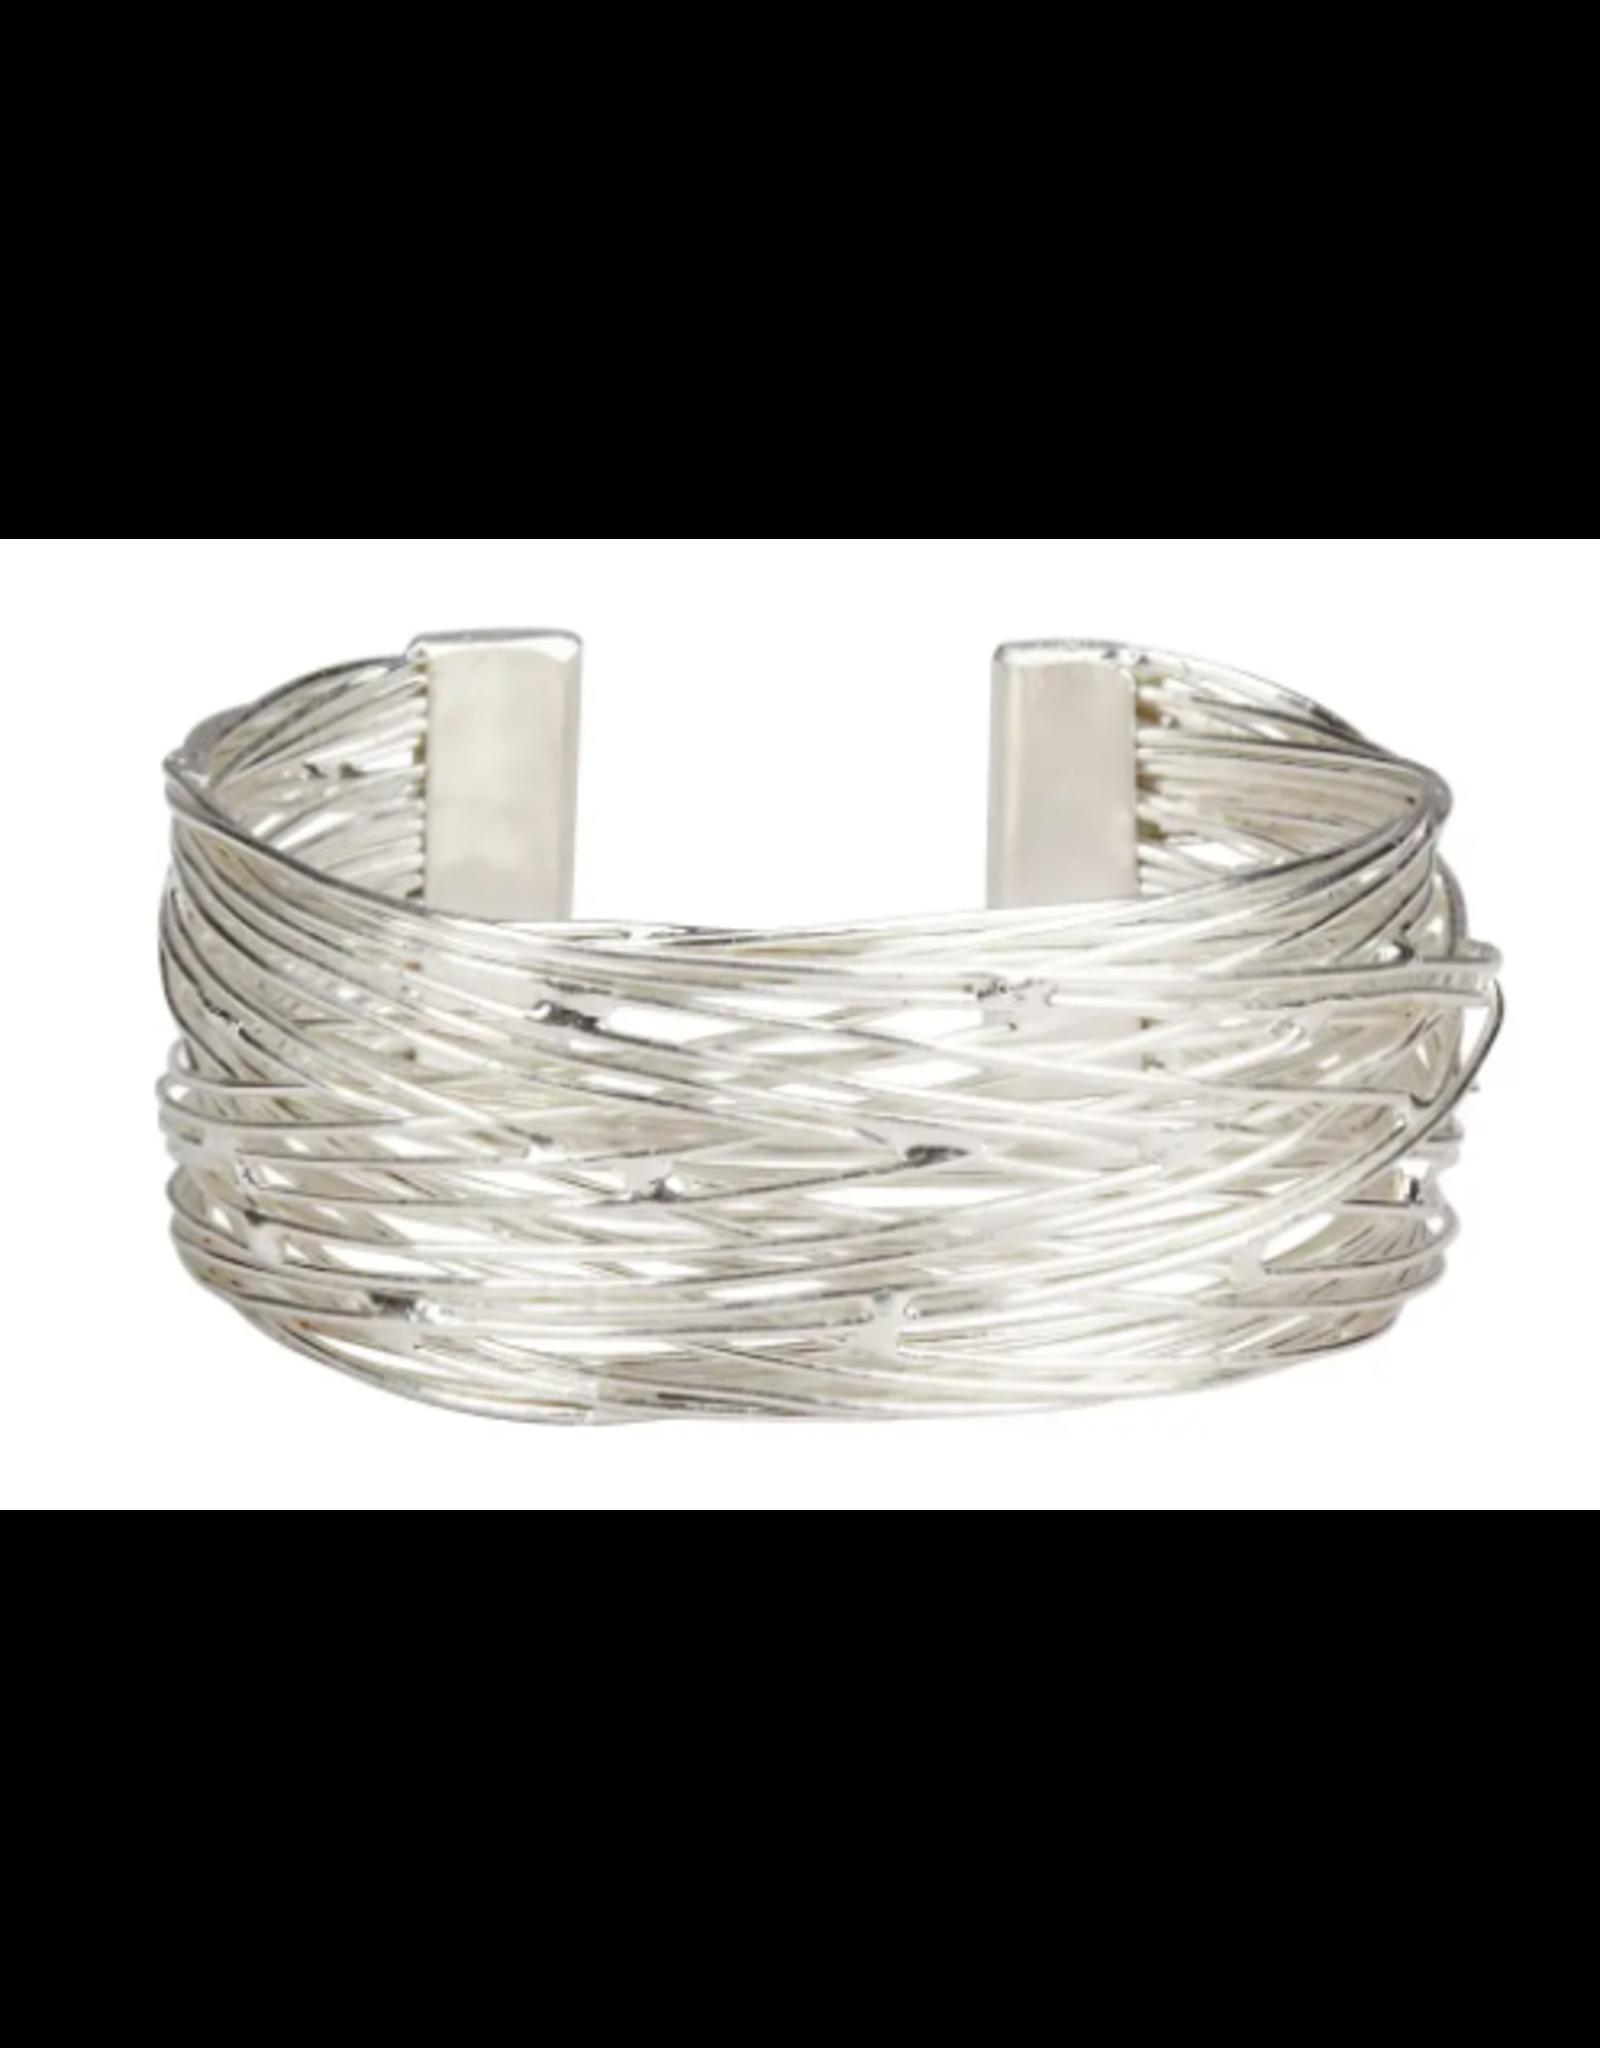 Silver Tone Birds Nest Bracelet, India